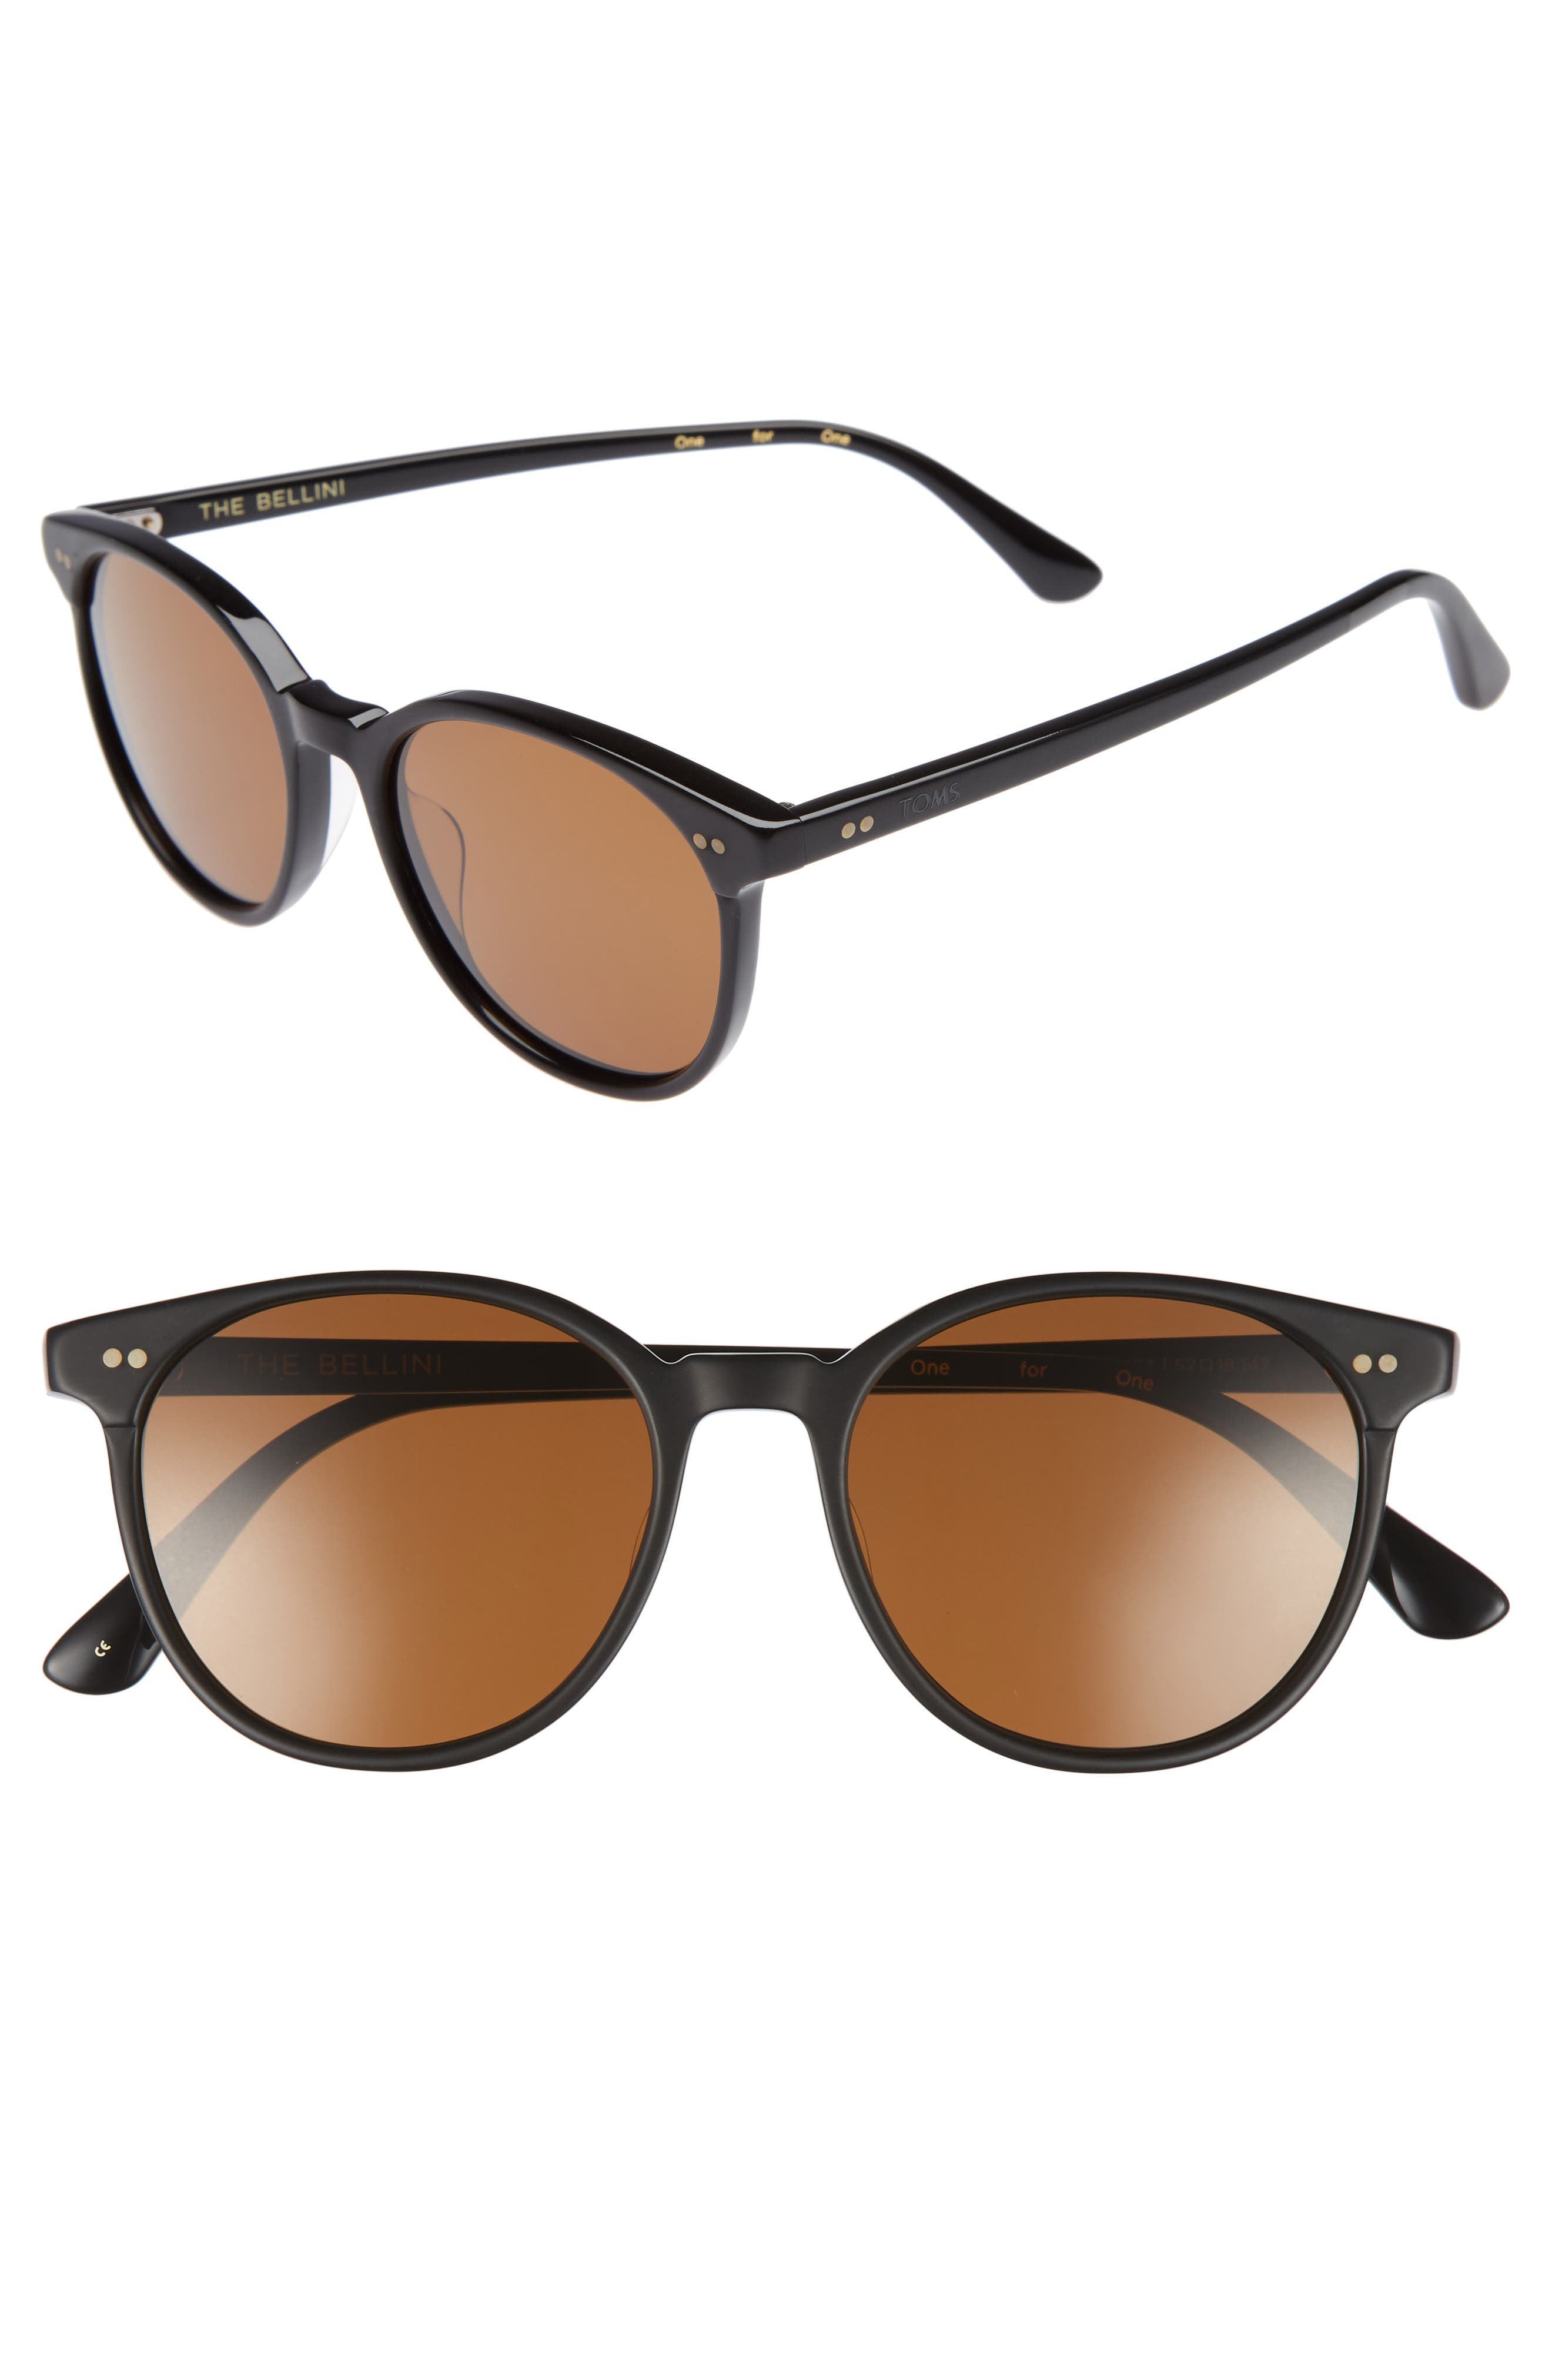 Bellini 52mm Sunglasses,                             Main thumbnail 1, color,                             001